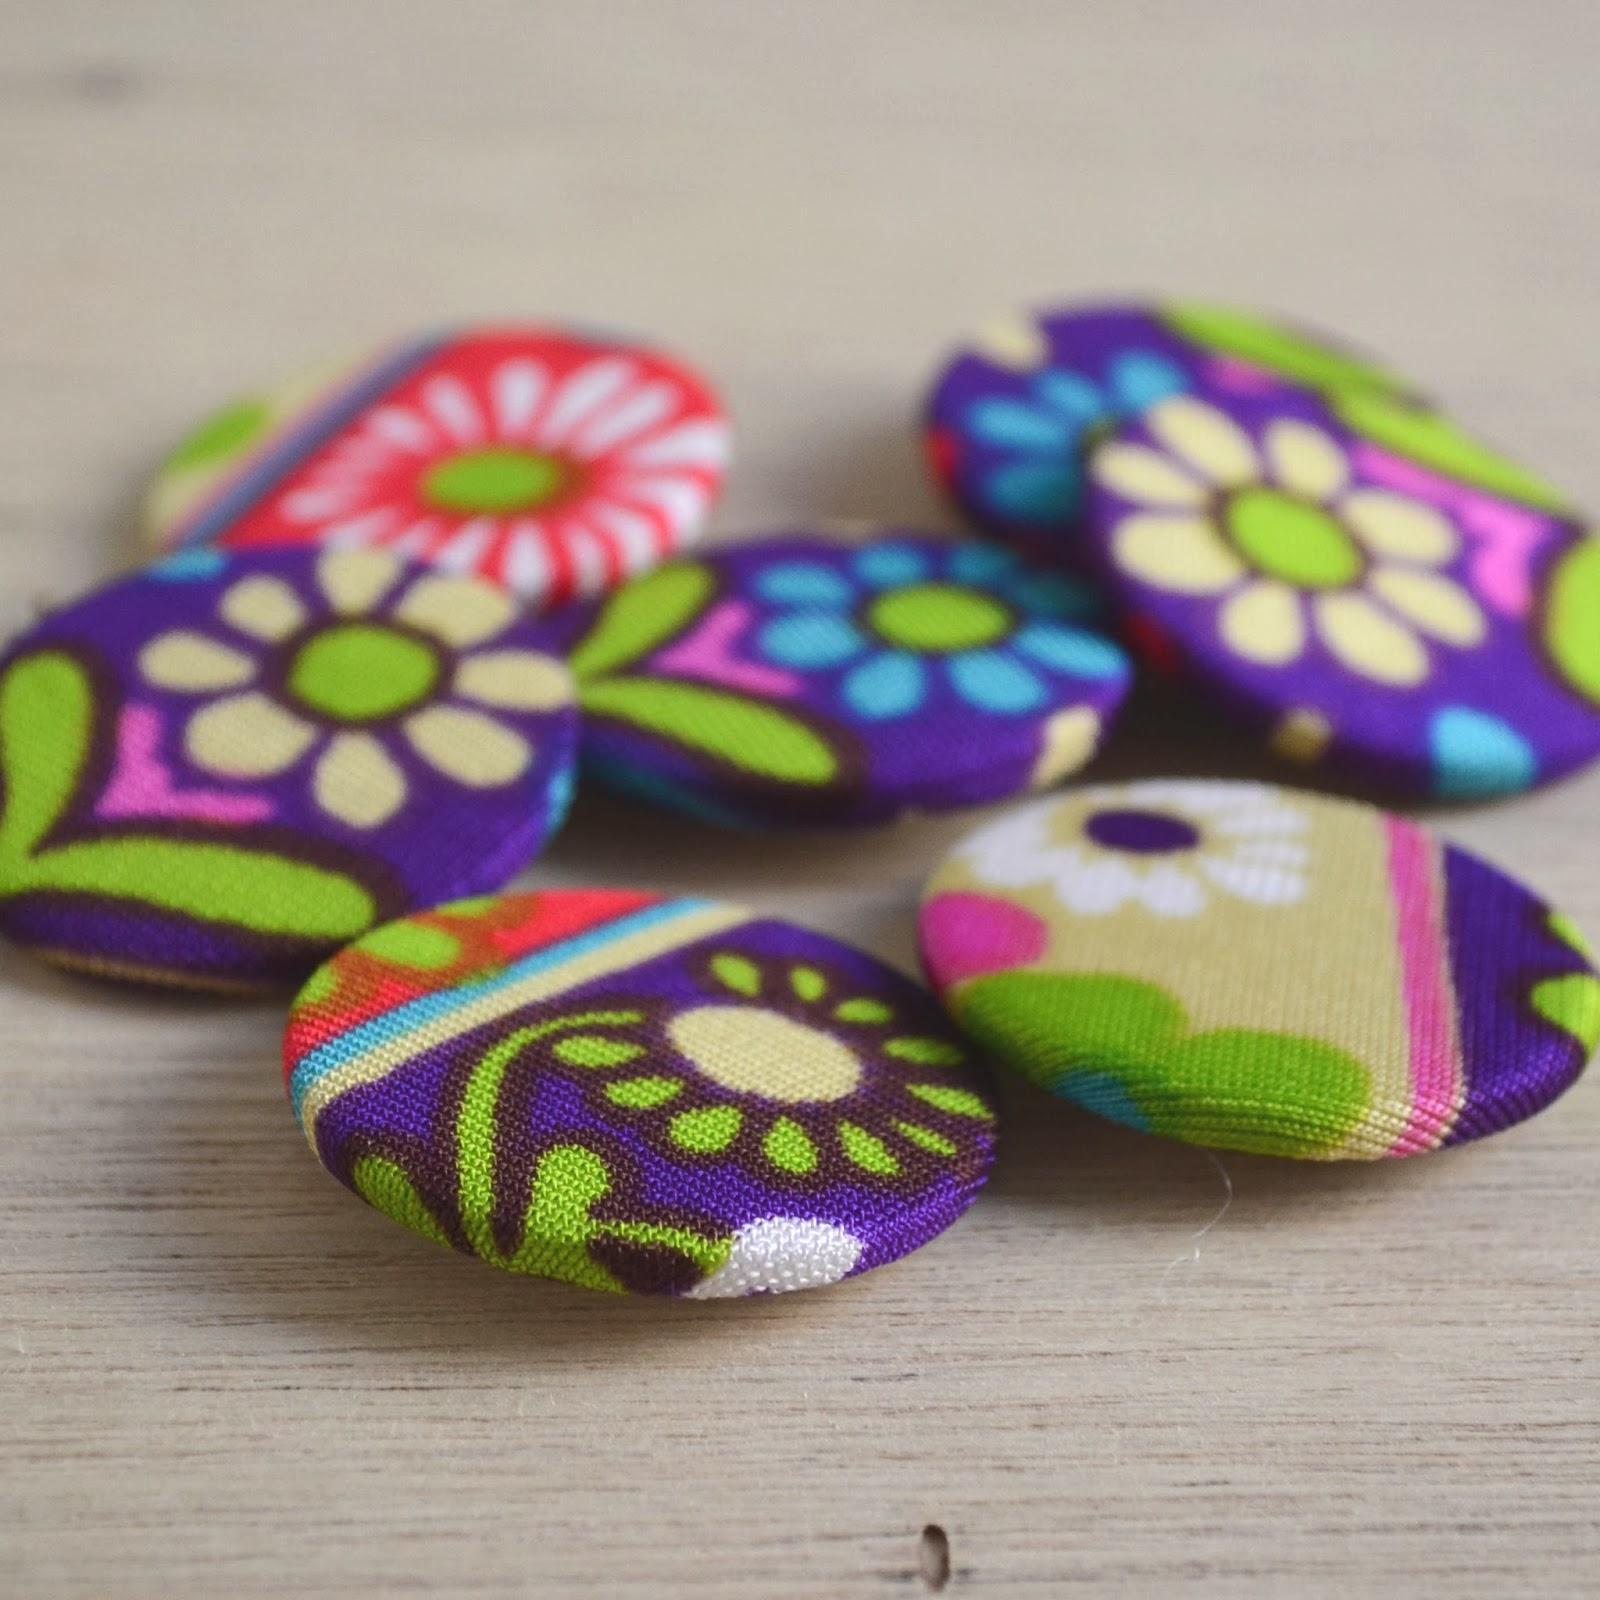 https://www.etsy.com/listing/175722434/retro-floral-fabric-badges?ref=shop_home_active_7